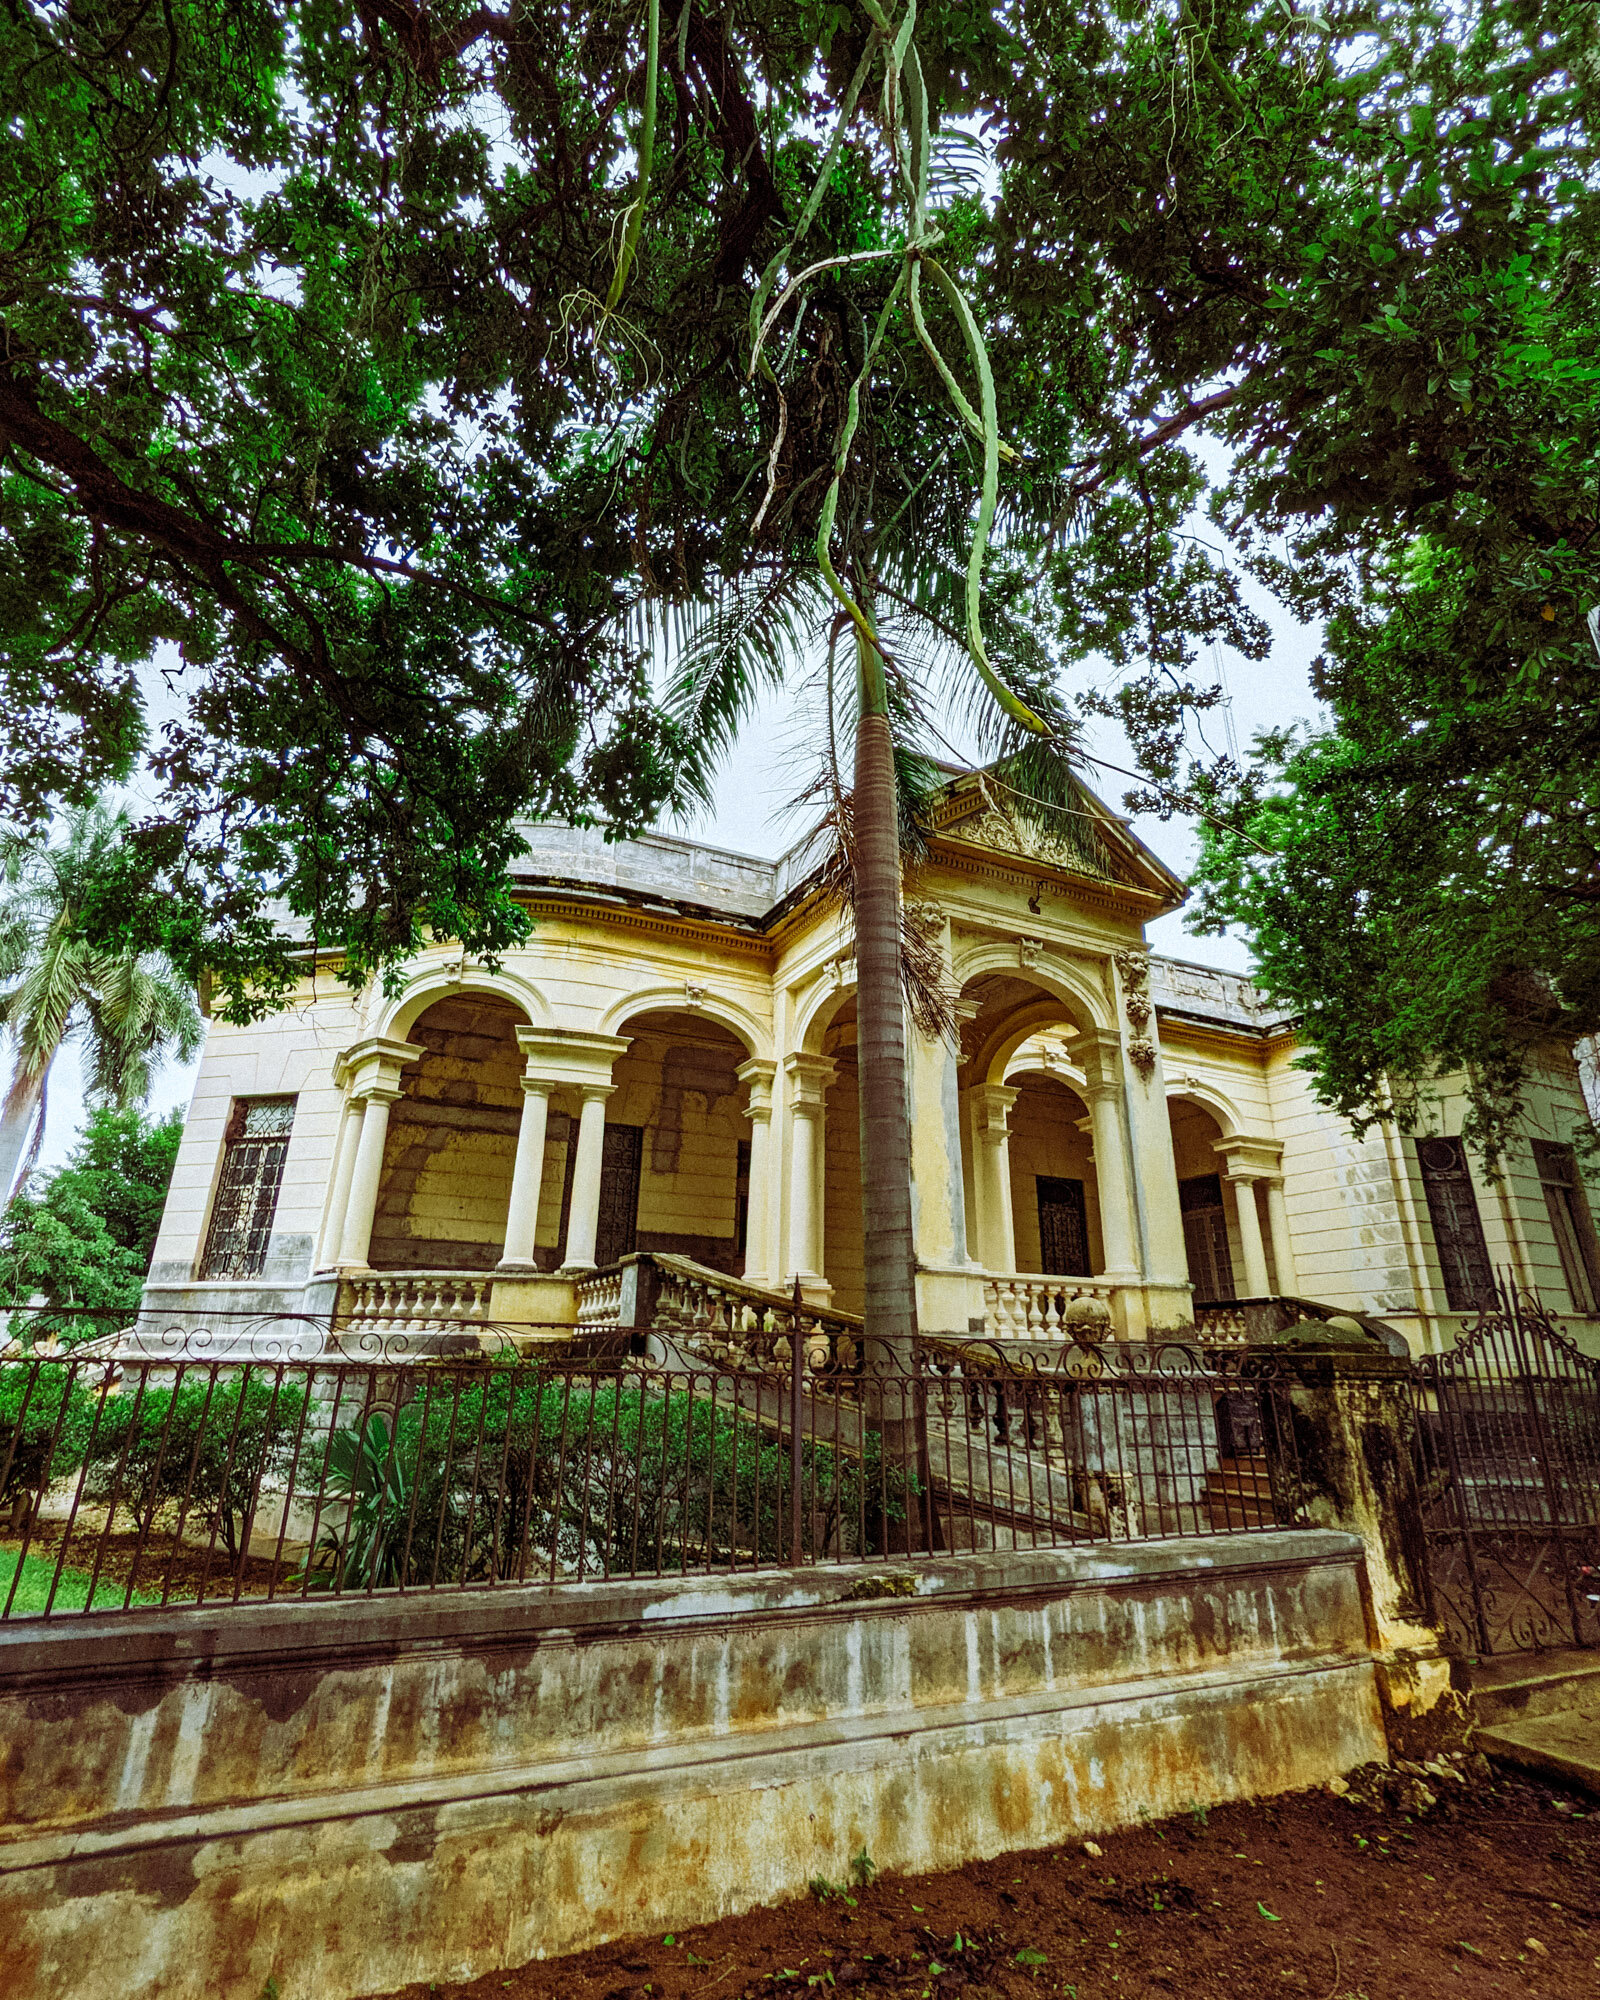 Rachel Off Duty: The Mansions on Paseo de Montejo, Merida